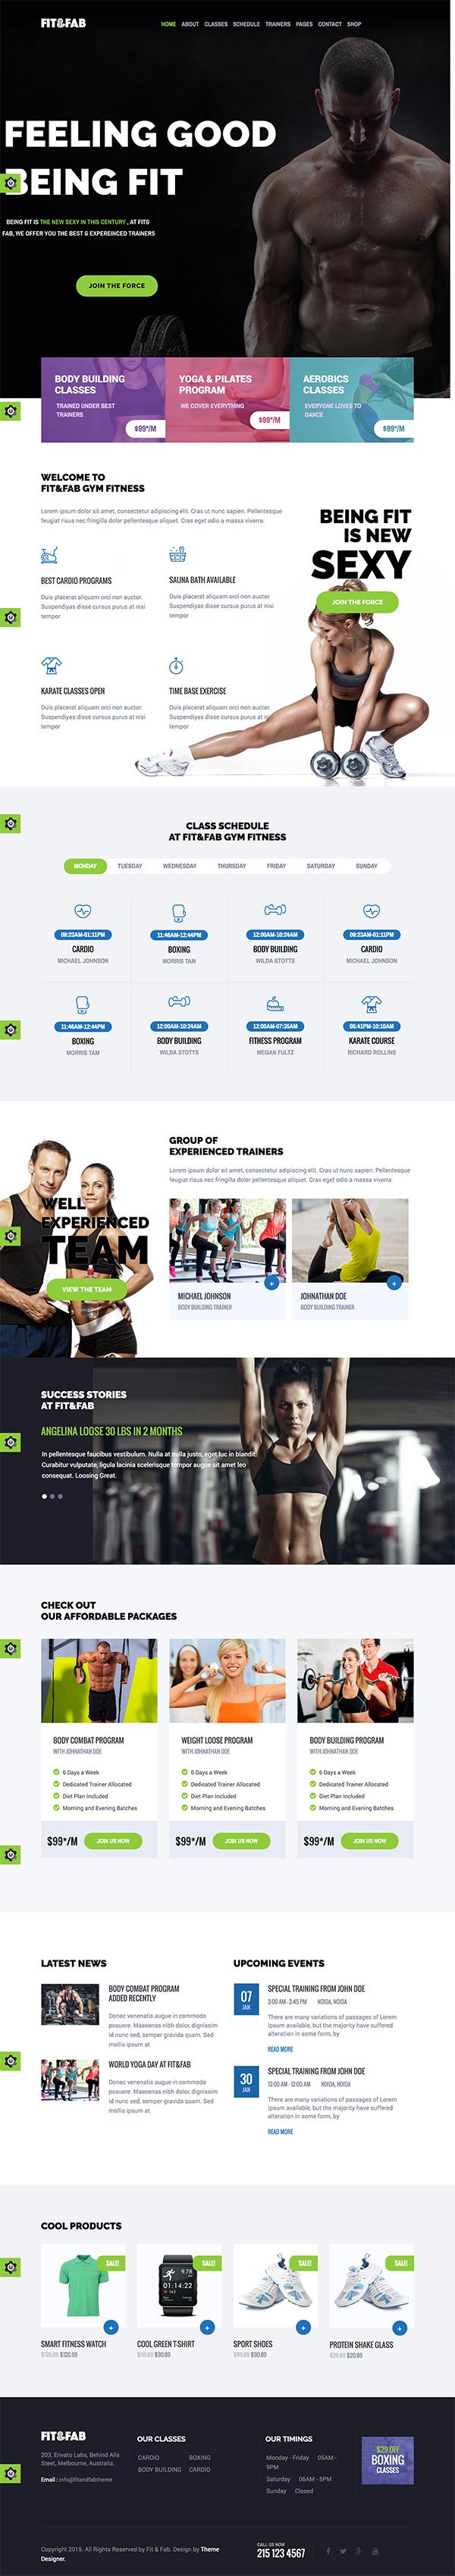 07 Fit & Fab - Aerobic, Gym and Fitness WordPress Theme